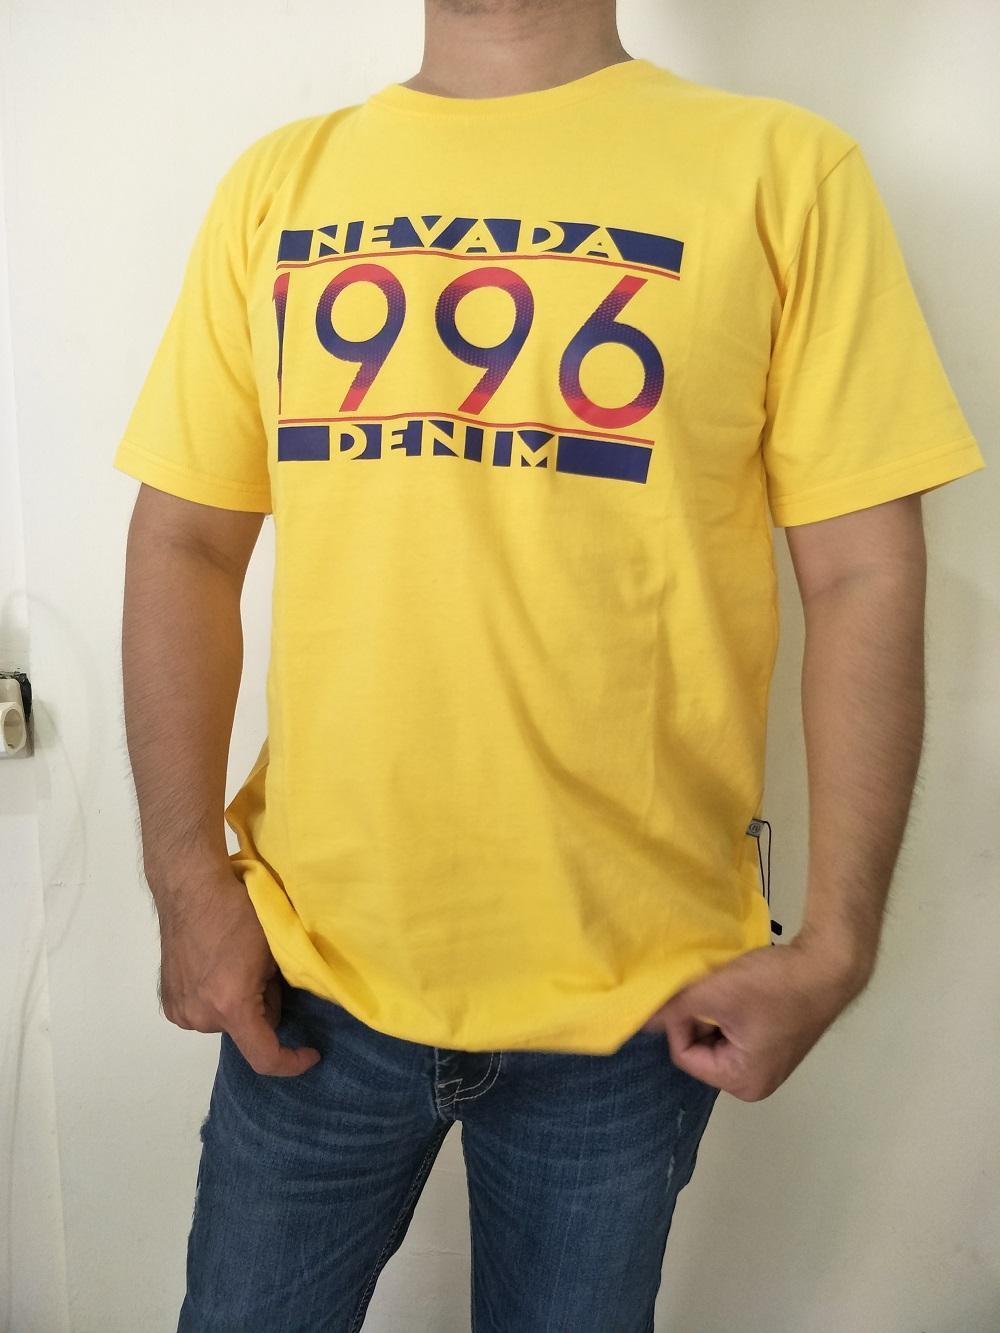 261 Kaos distro Nevada premium Quality TSHIRT PRIA / RAGLAN / KAOS PRIA / KAOS BRANDED ORIGINAL MATAHARi